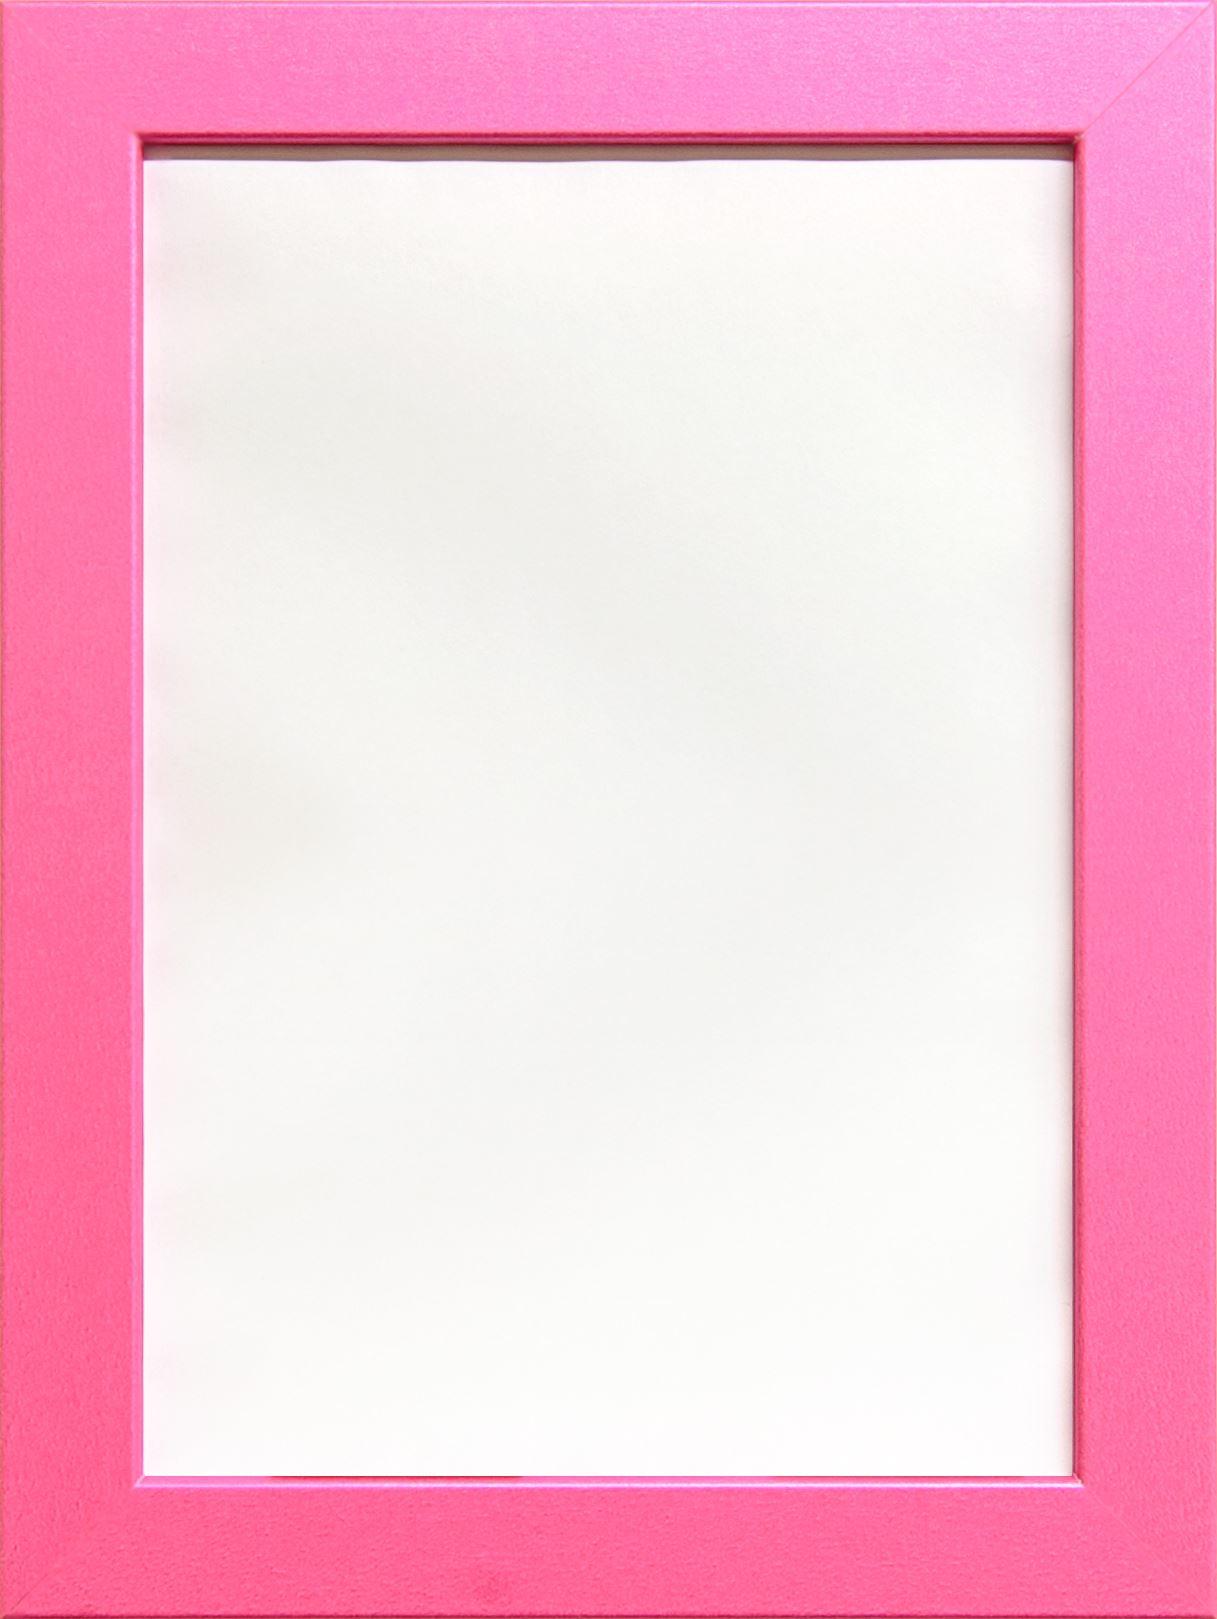 Poster Large Frame Sizes